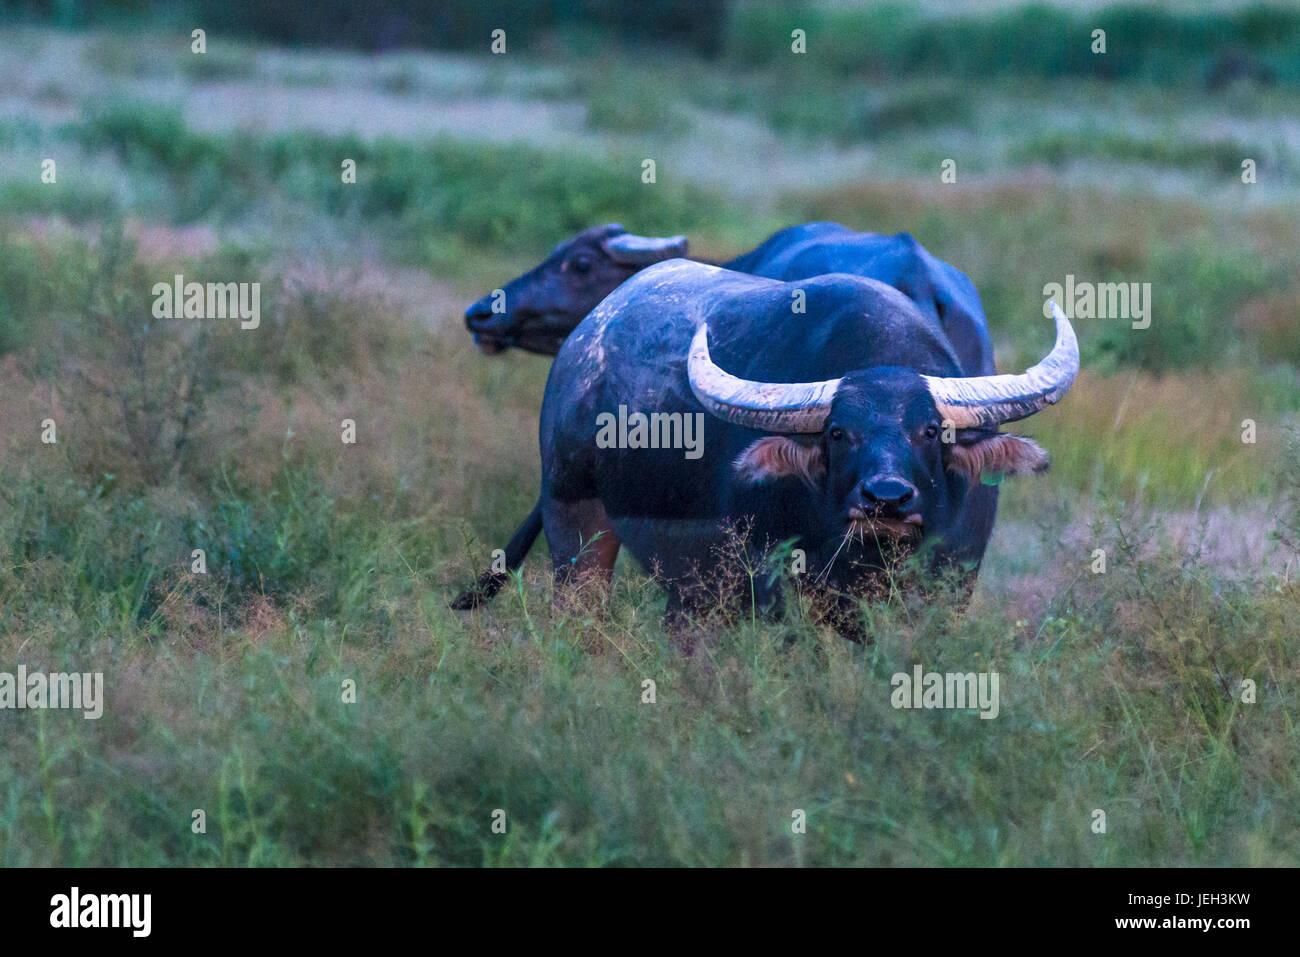 Water Buffalos in Kakadu National Park, Northern Territory, Australia. - Stock Image